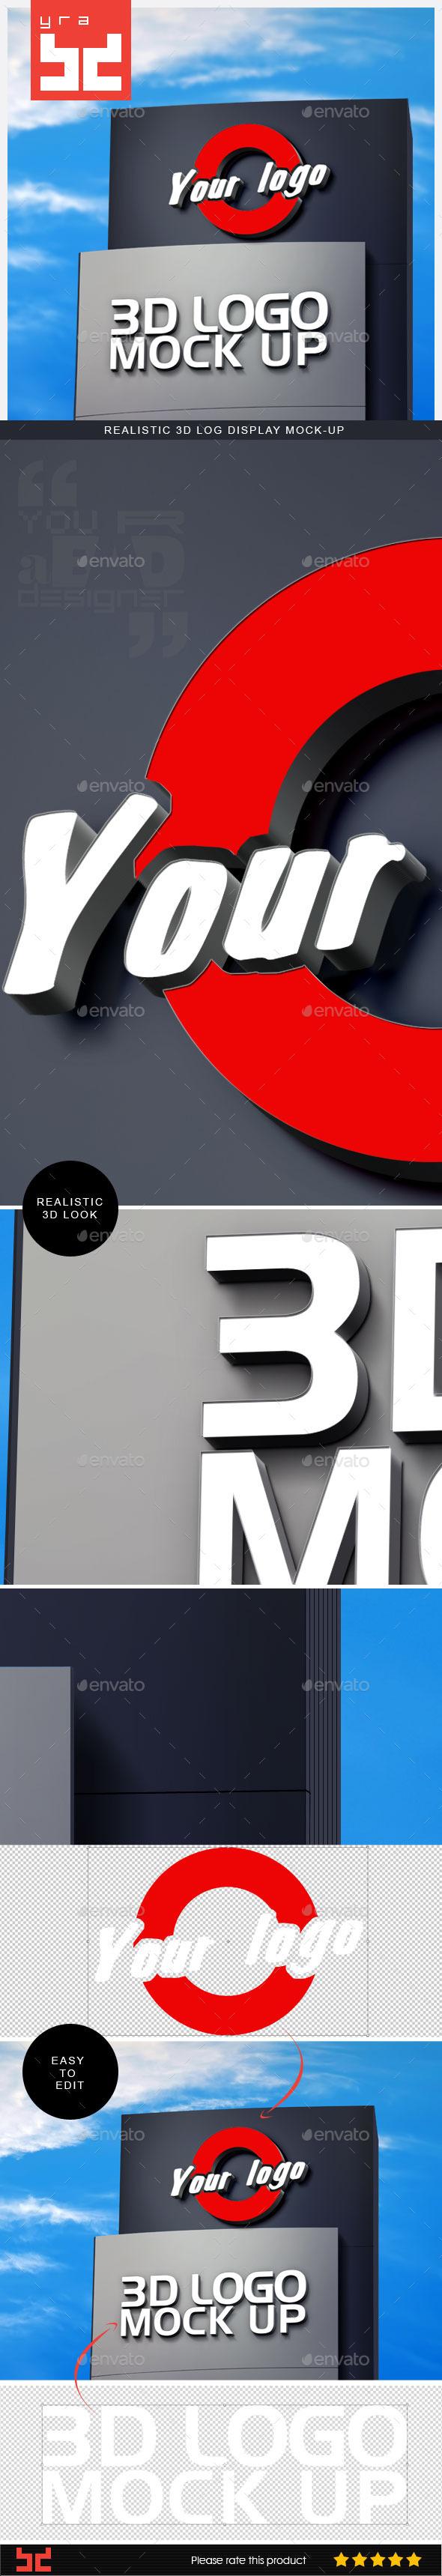 Realistic 3D Logo Mockup V1